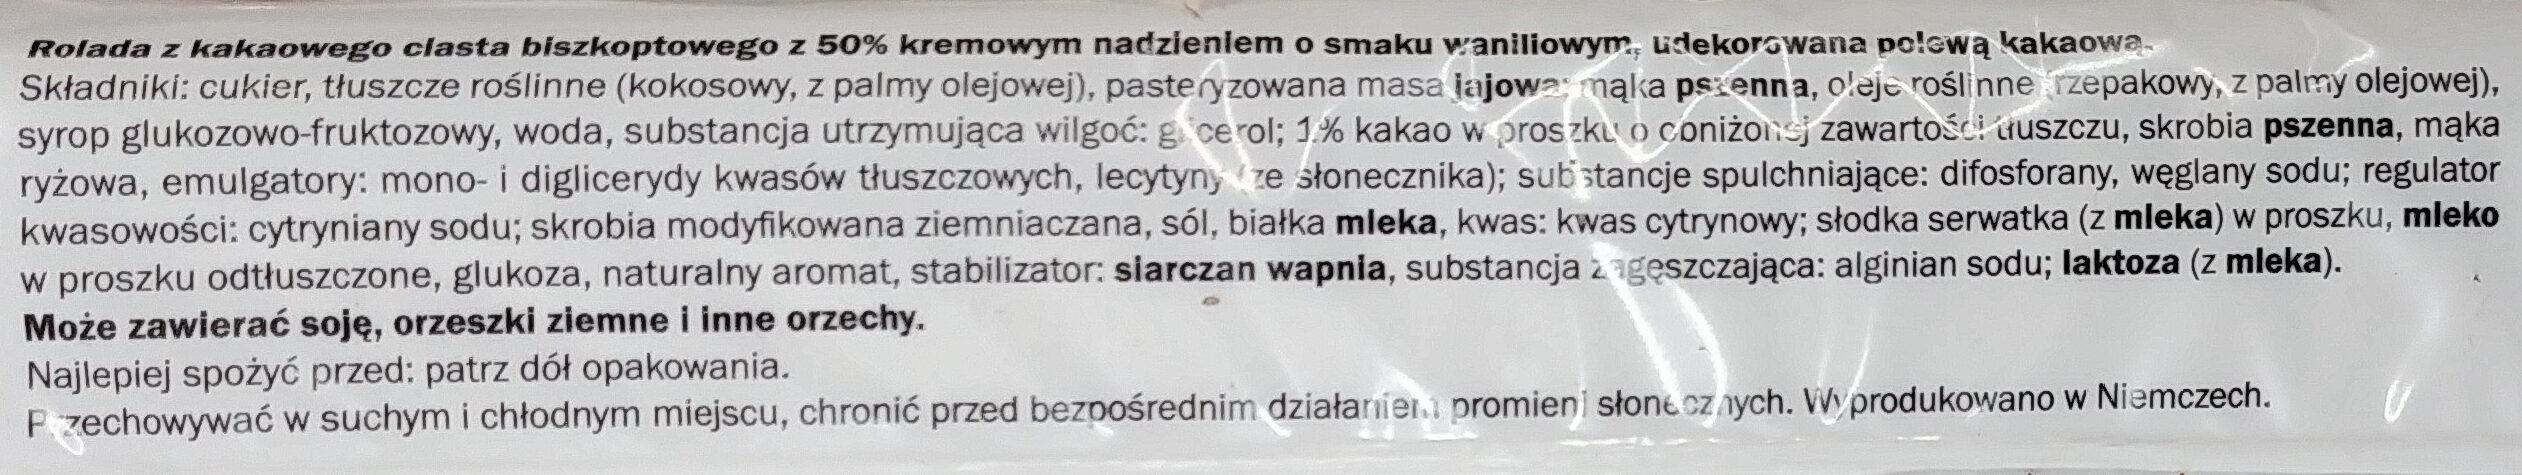 Cake cacao - Składniki - pl